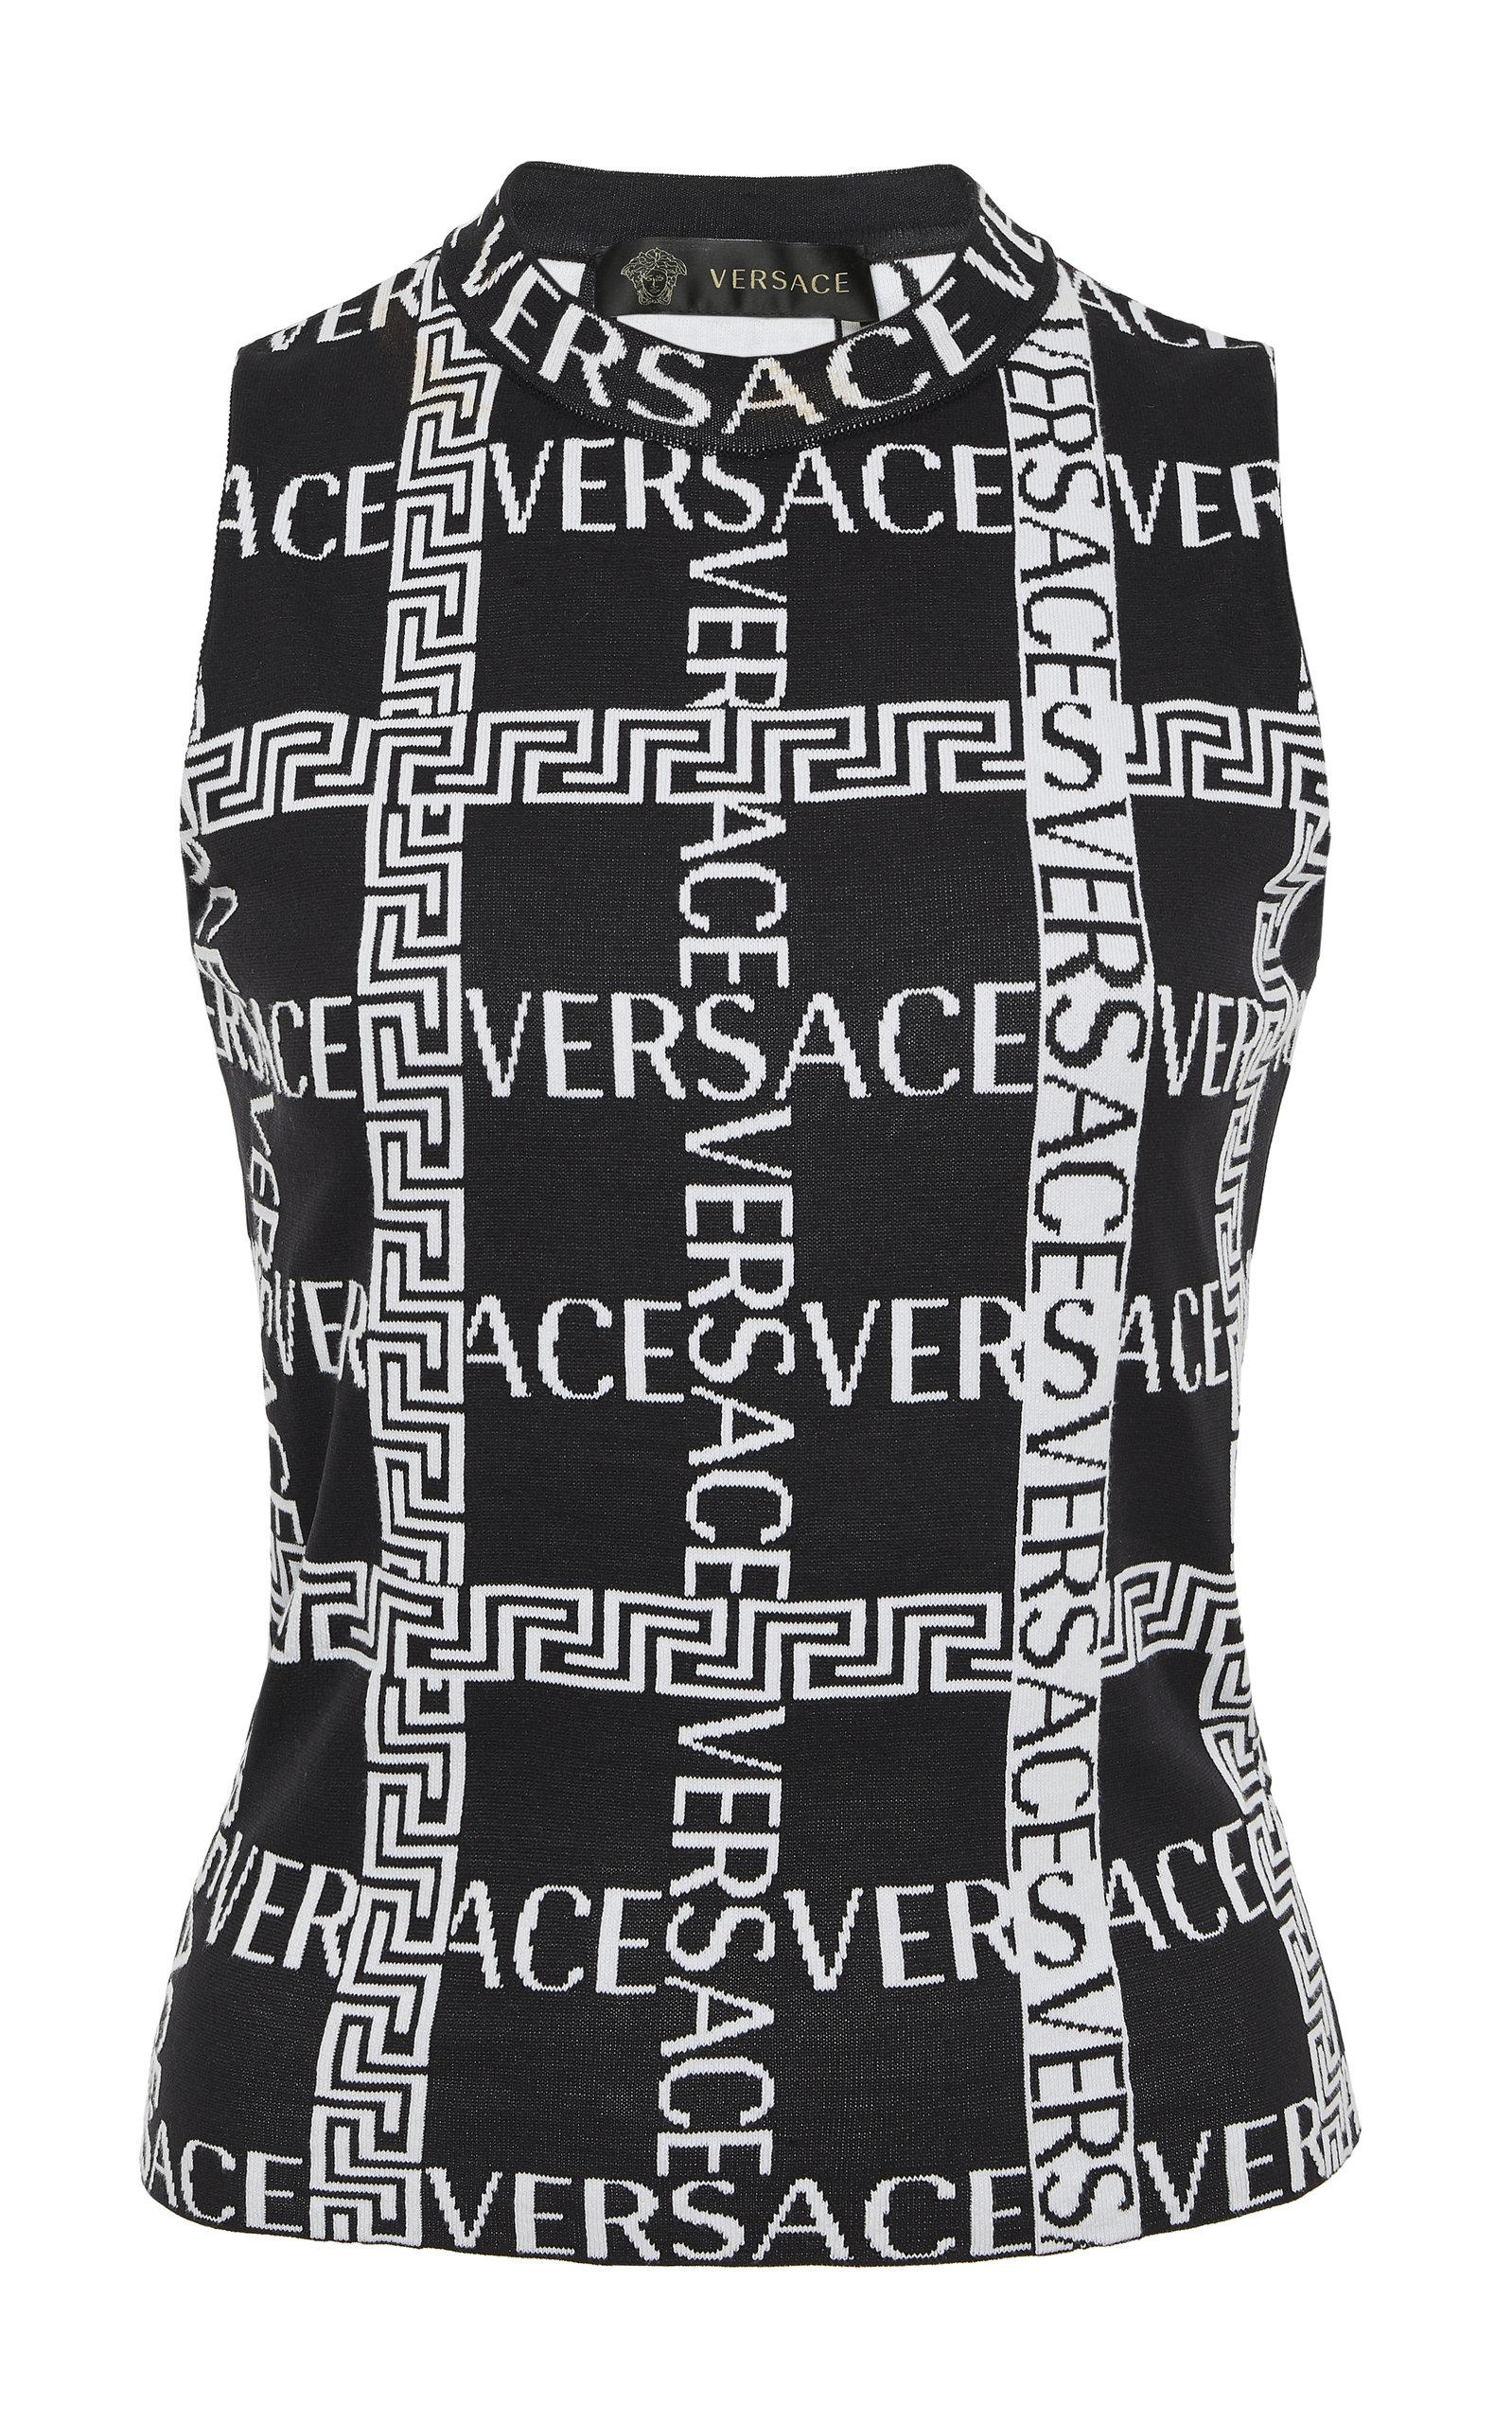 fb8061dd46cd57 Logo Cotton-Blend Crop Top by Versace